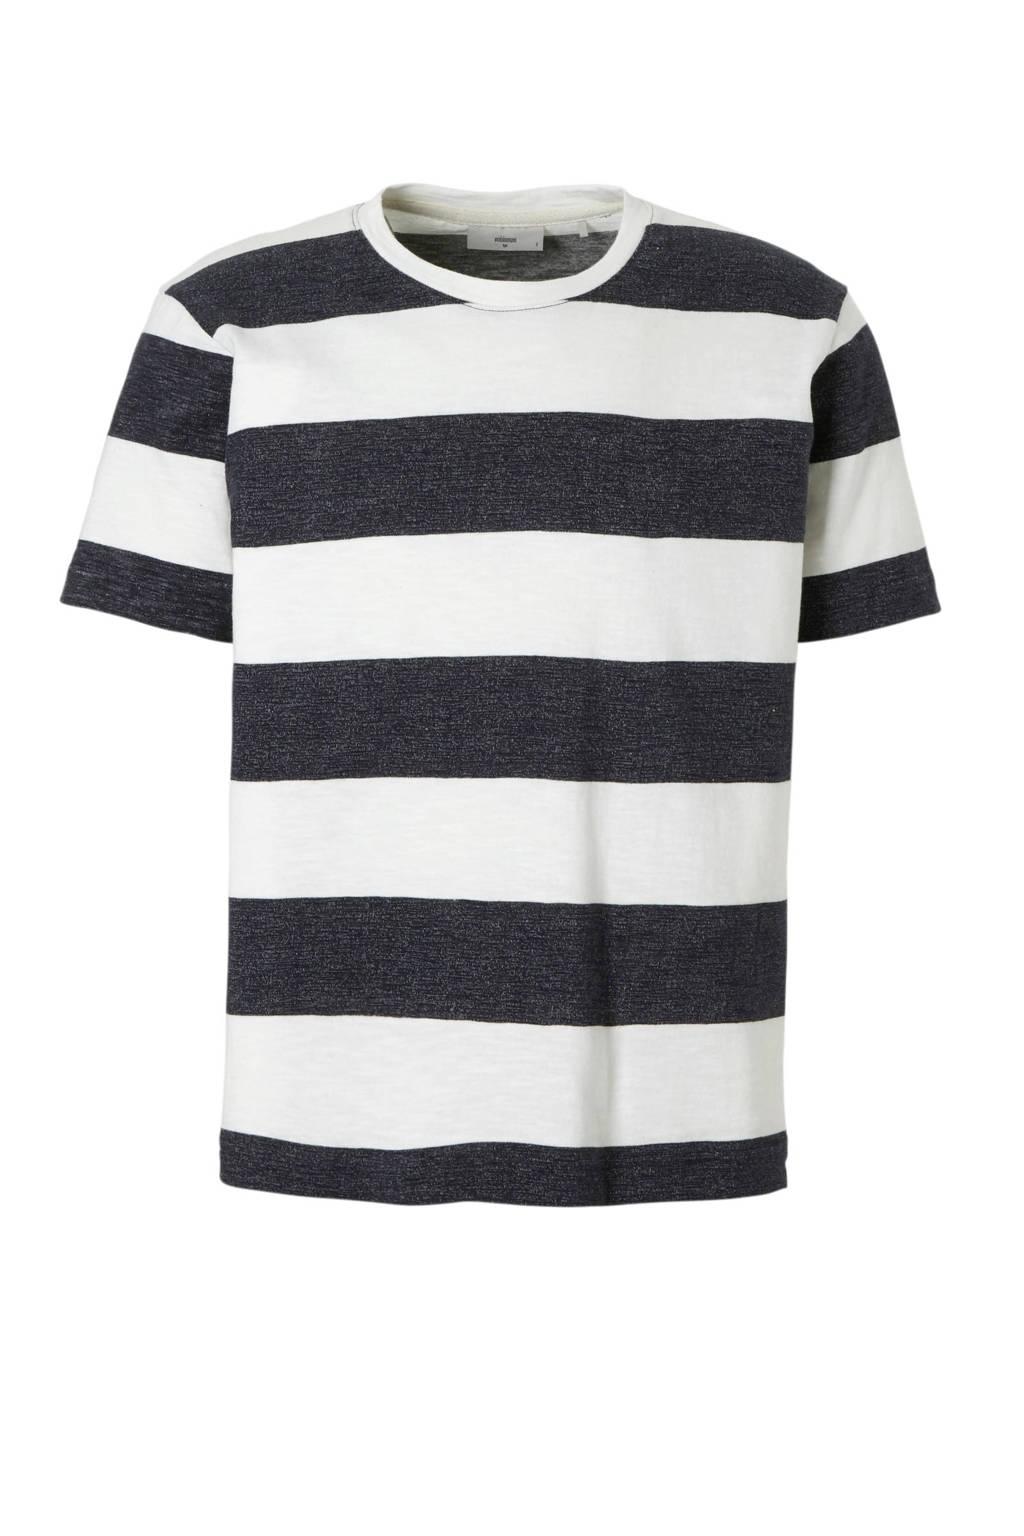 Minimum Asker T-shirt, Donkerblauw/wit